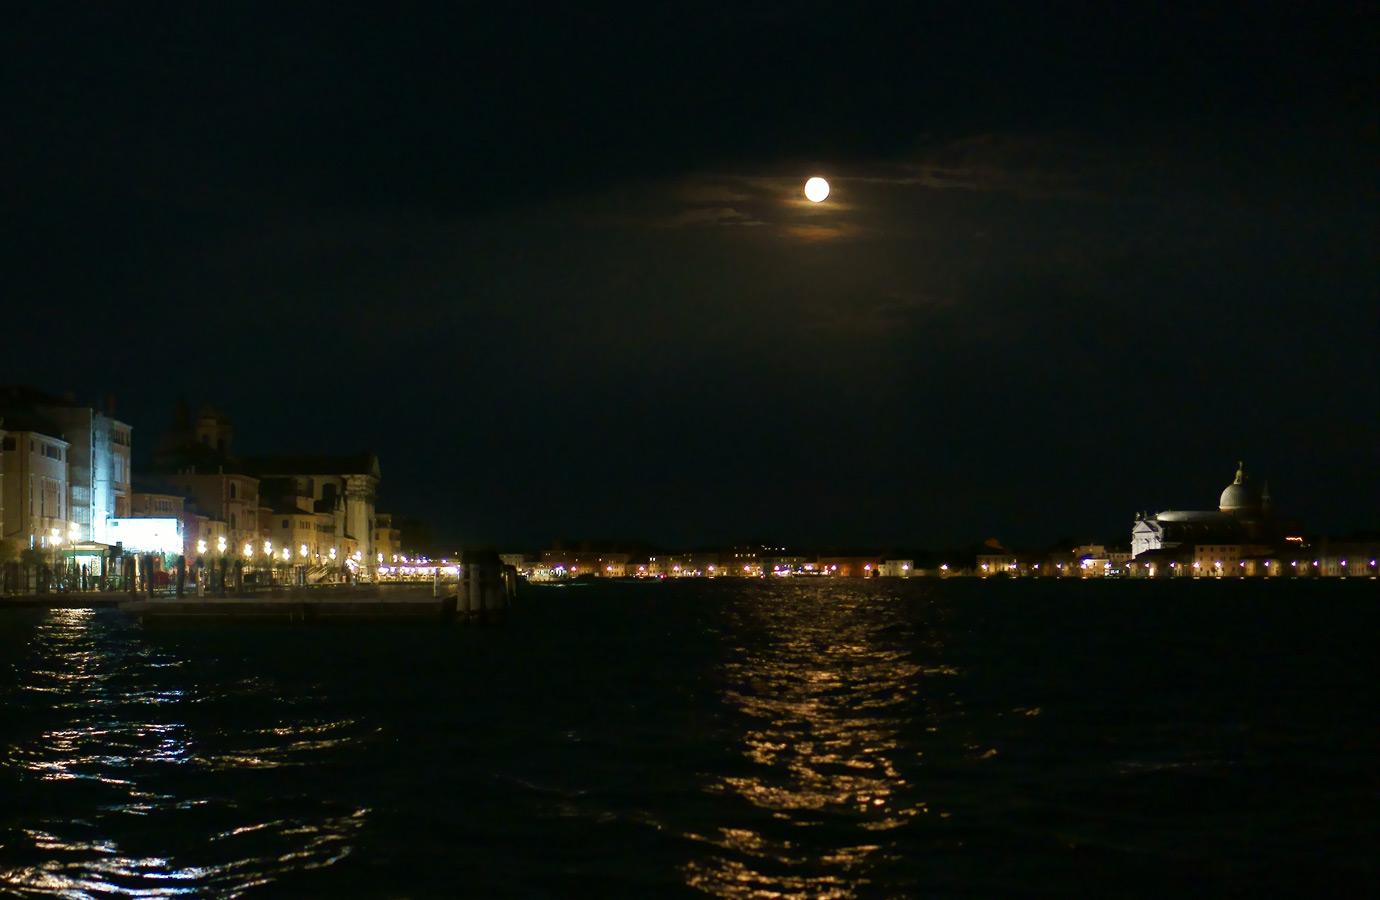 Venice at night 2016